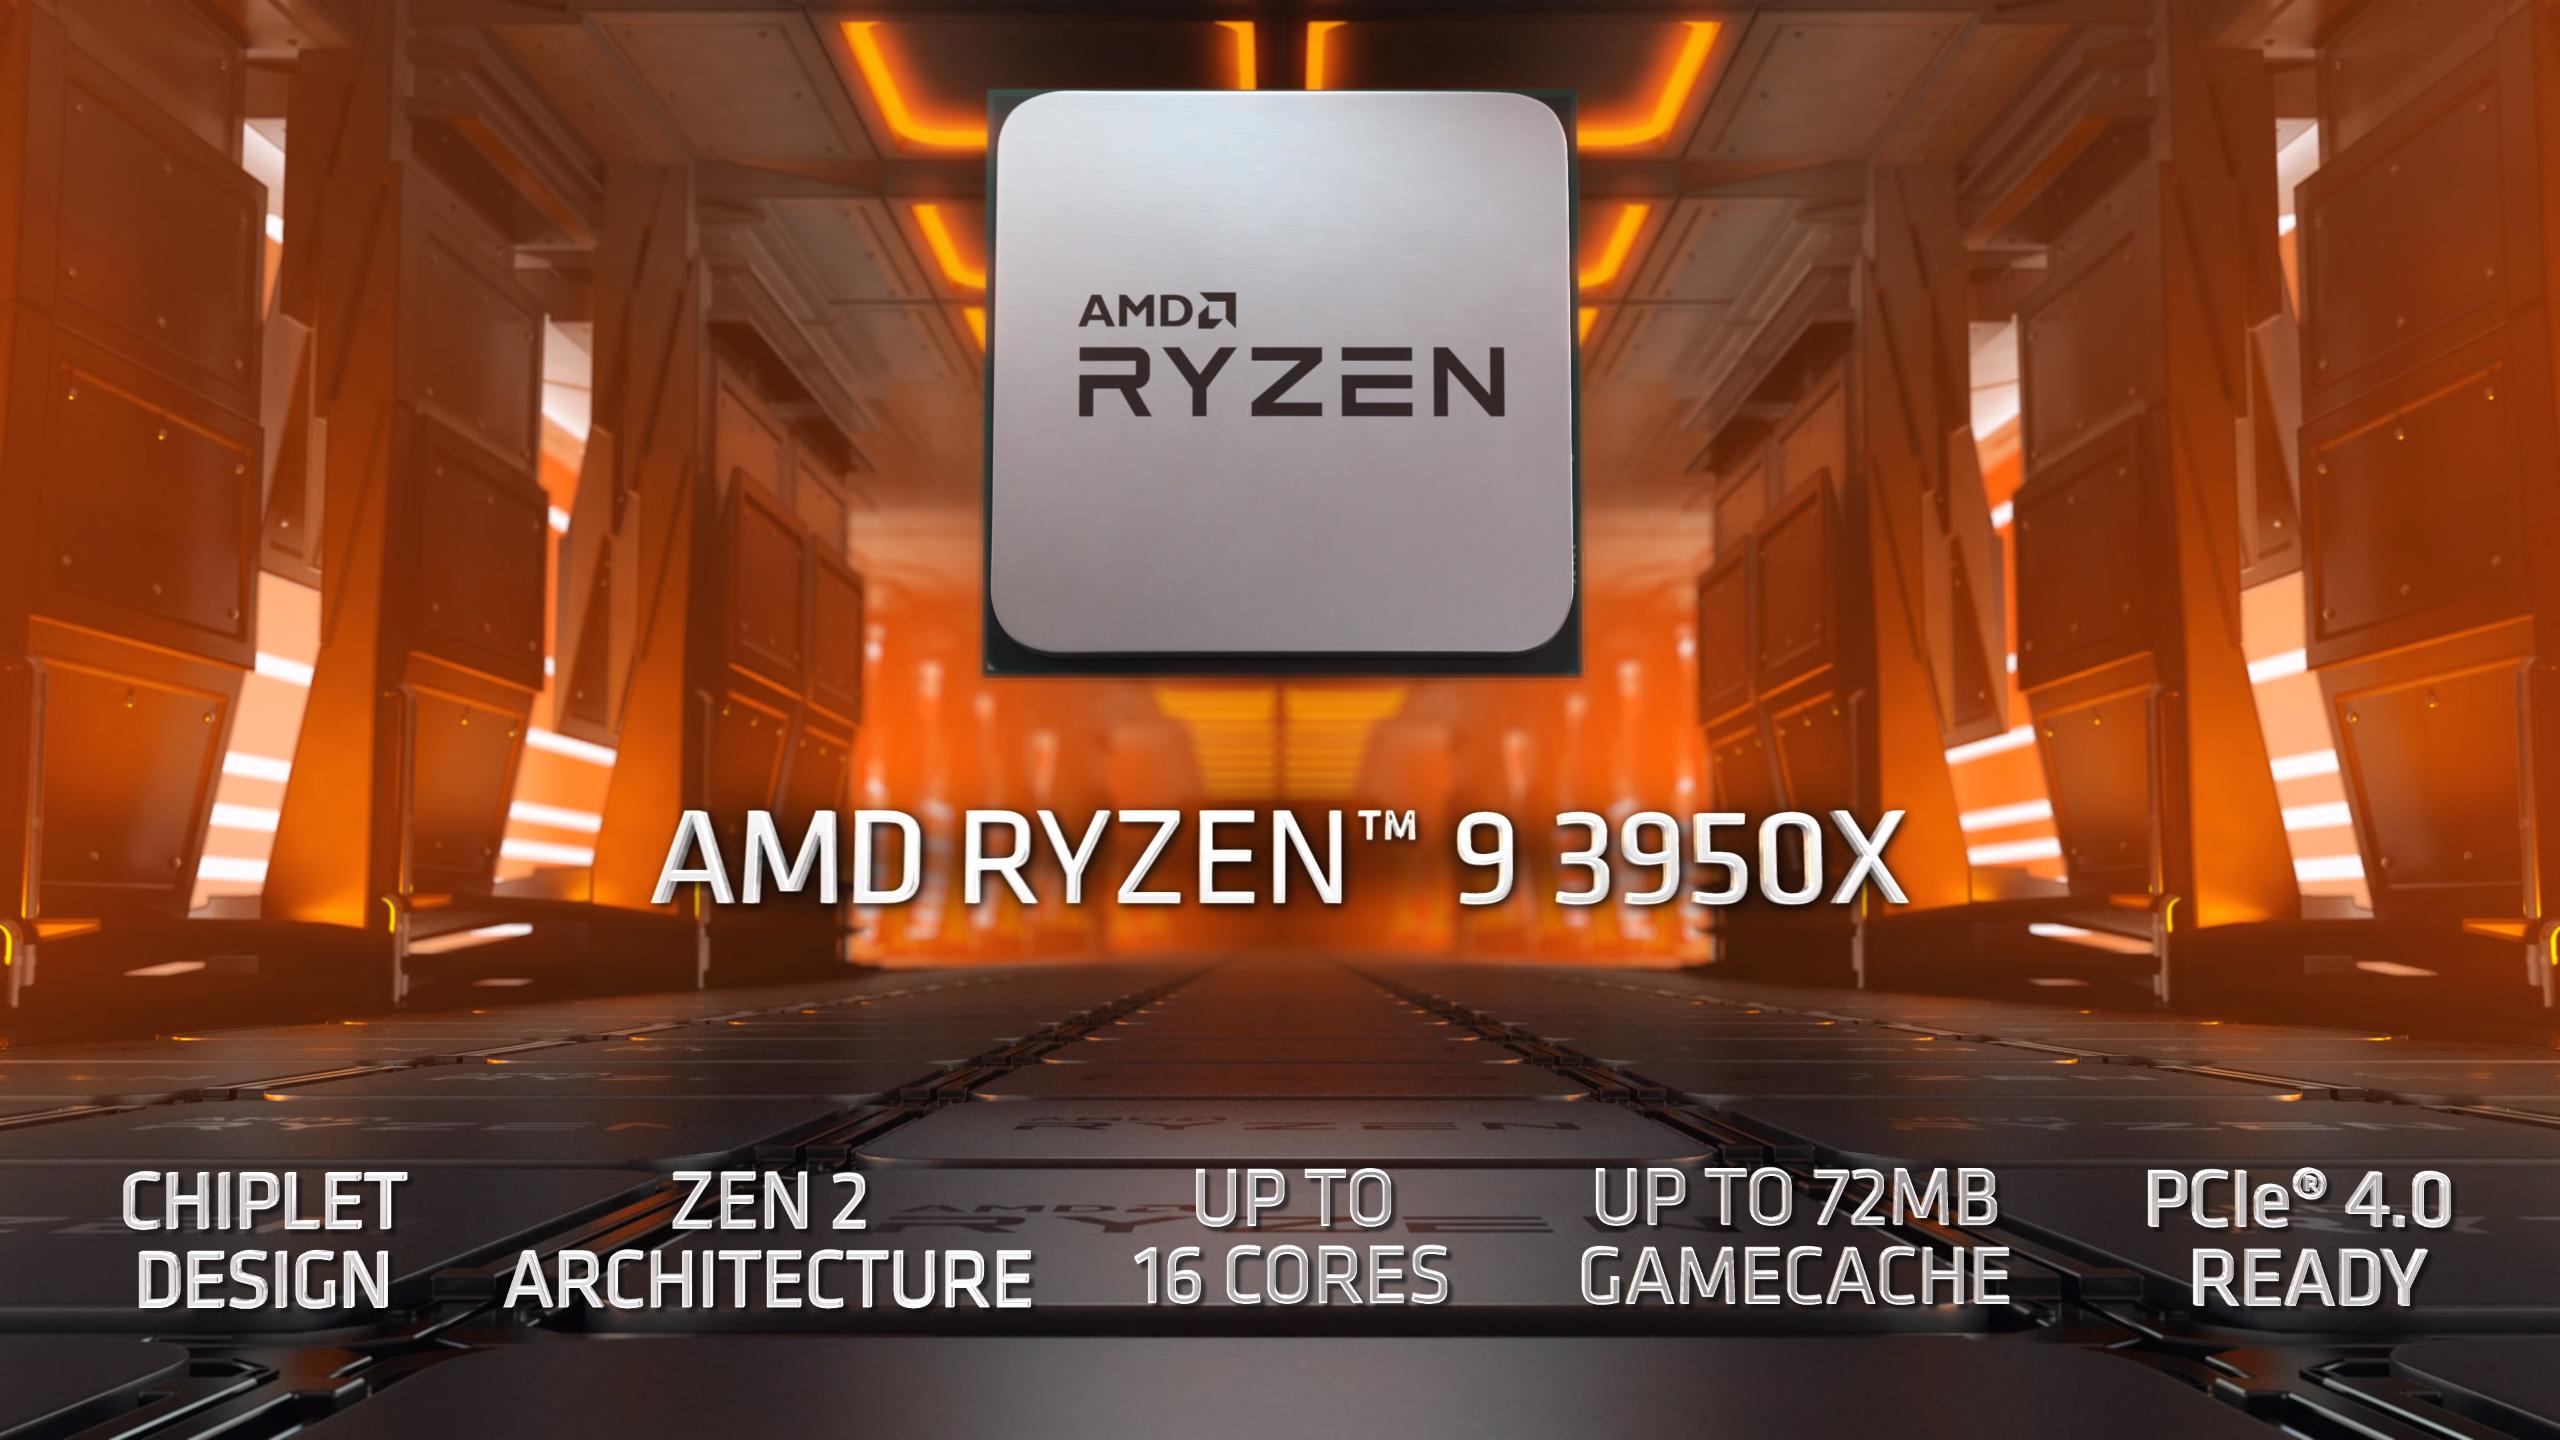 AMD Ryzen 9 3950X 16 Core Overclocked To 5 GHz, 5100 DDR4 Memory